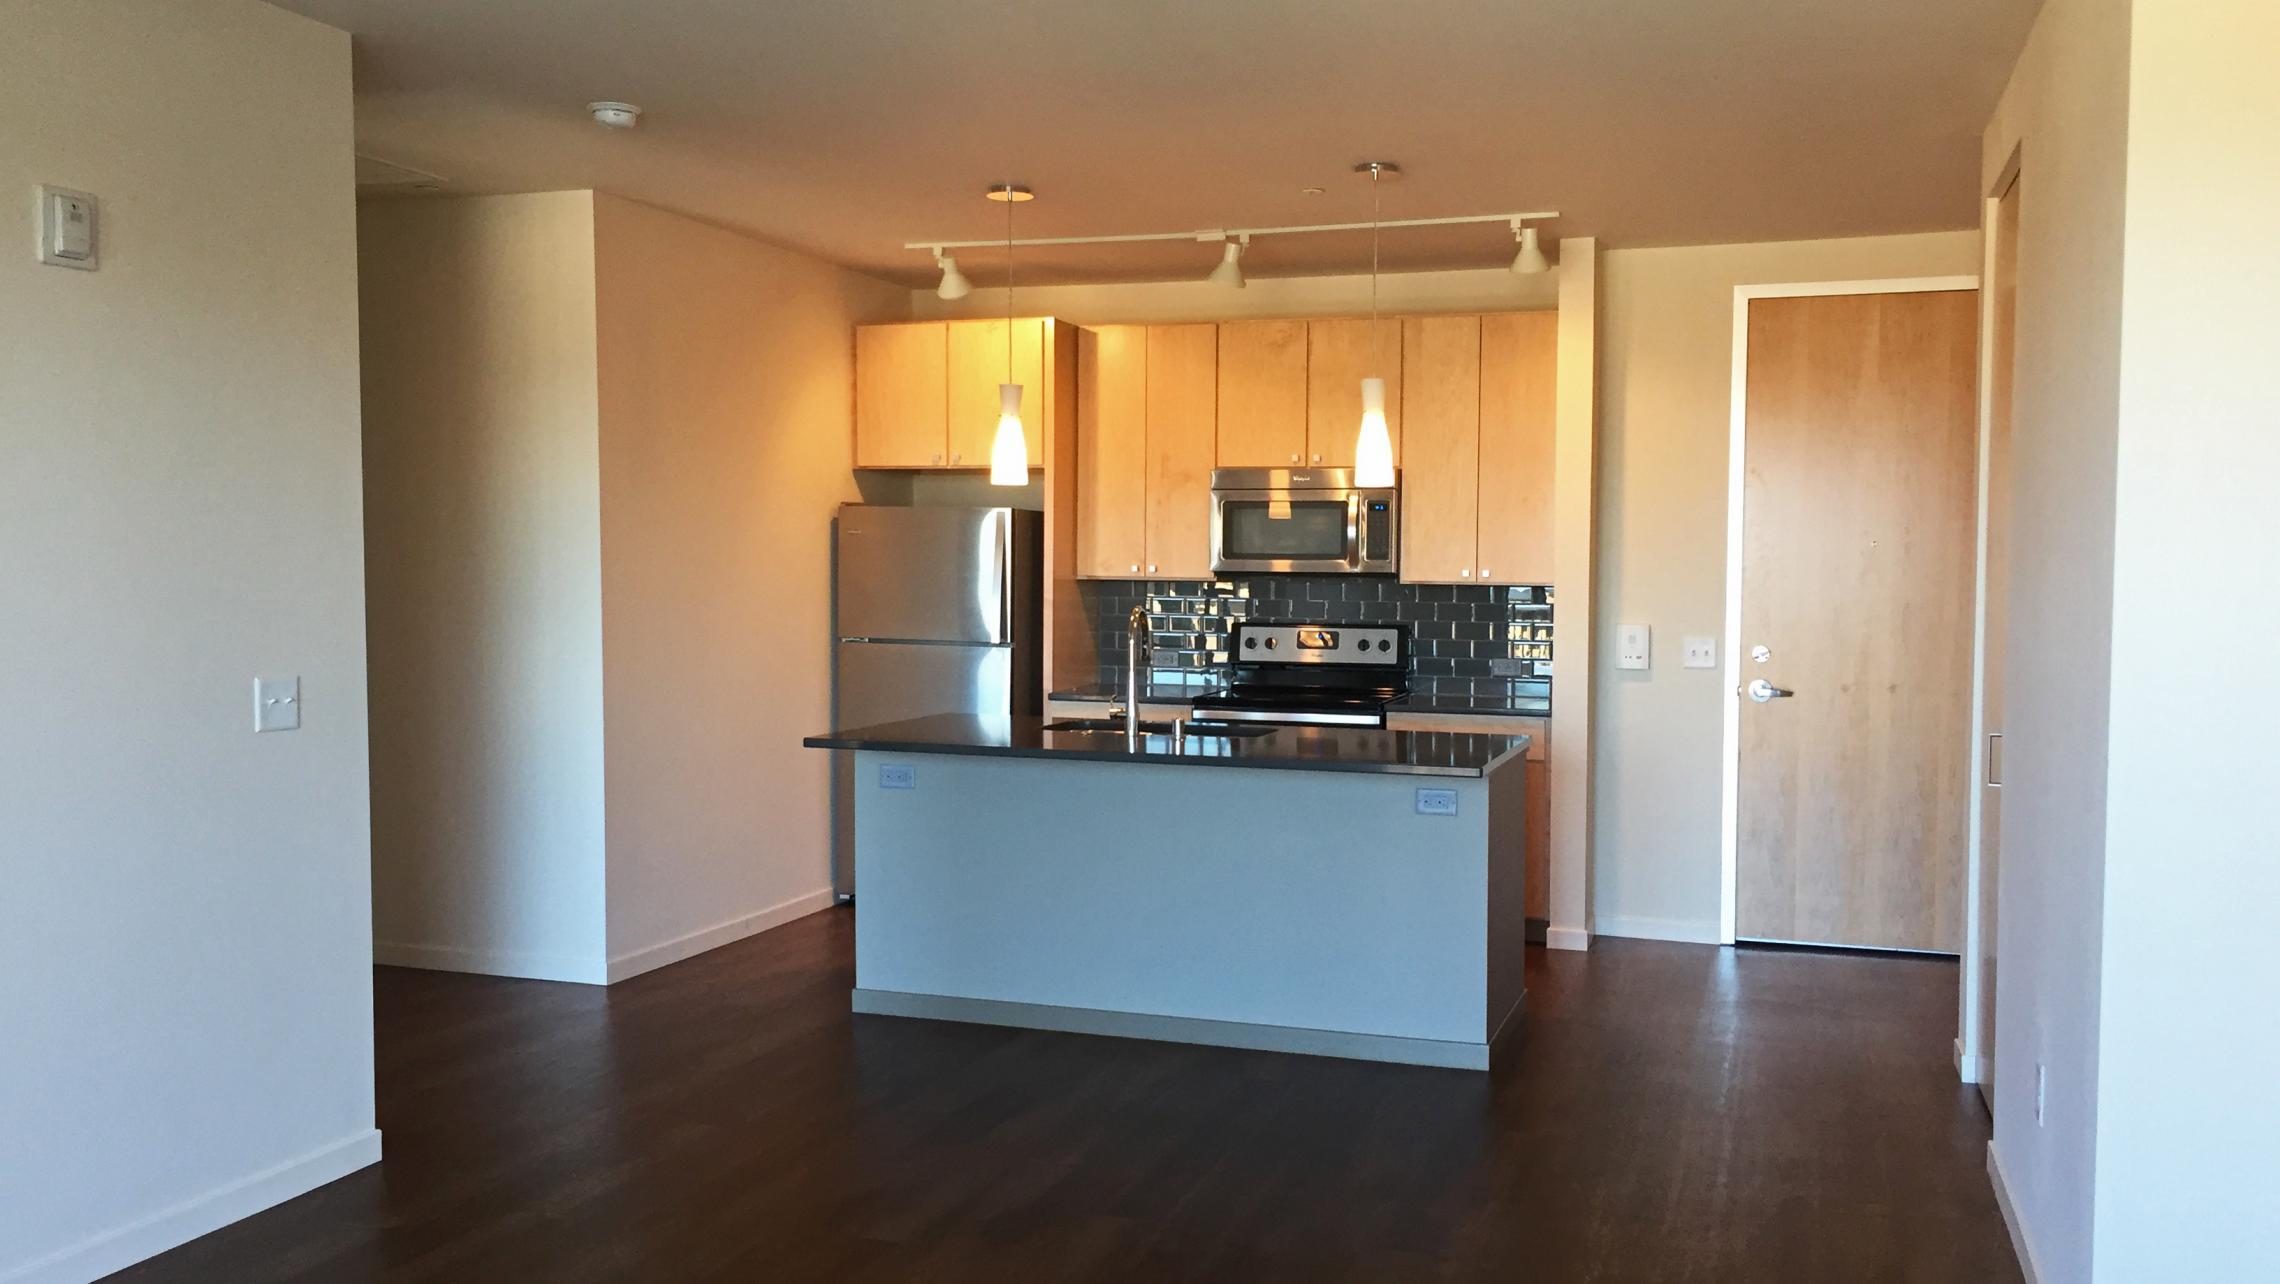 ULI Nine Line Apartment 516 - Kitchen